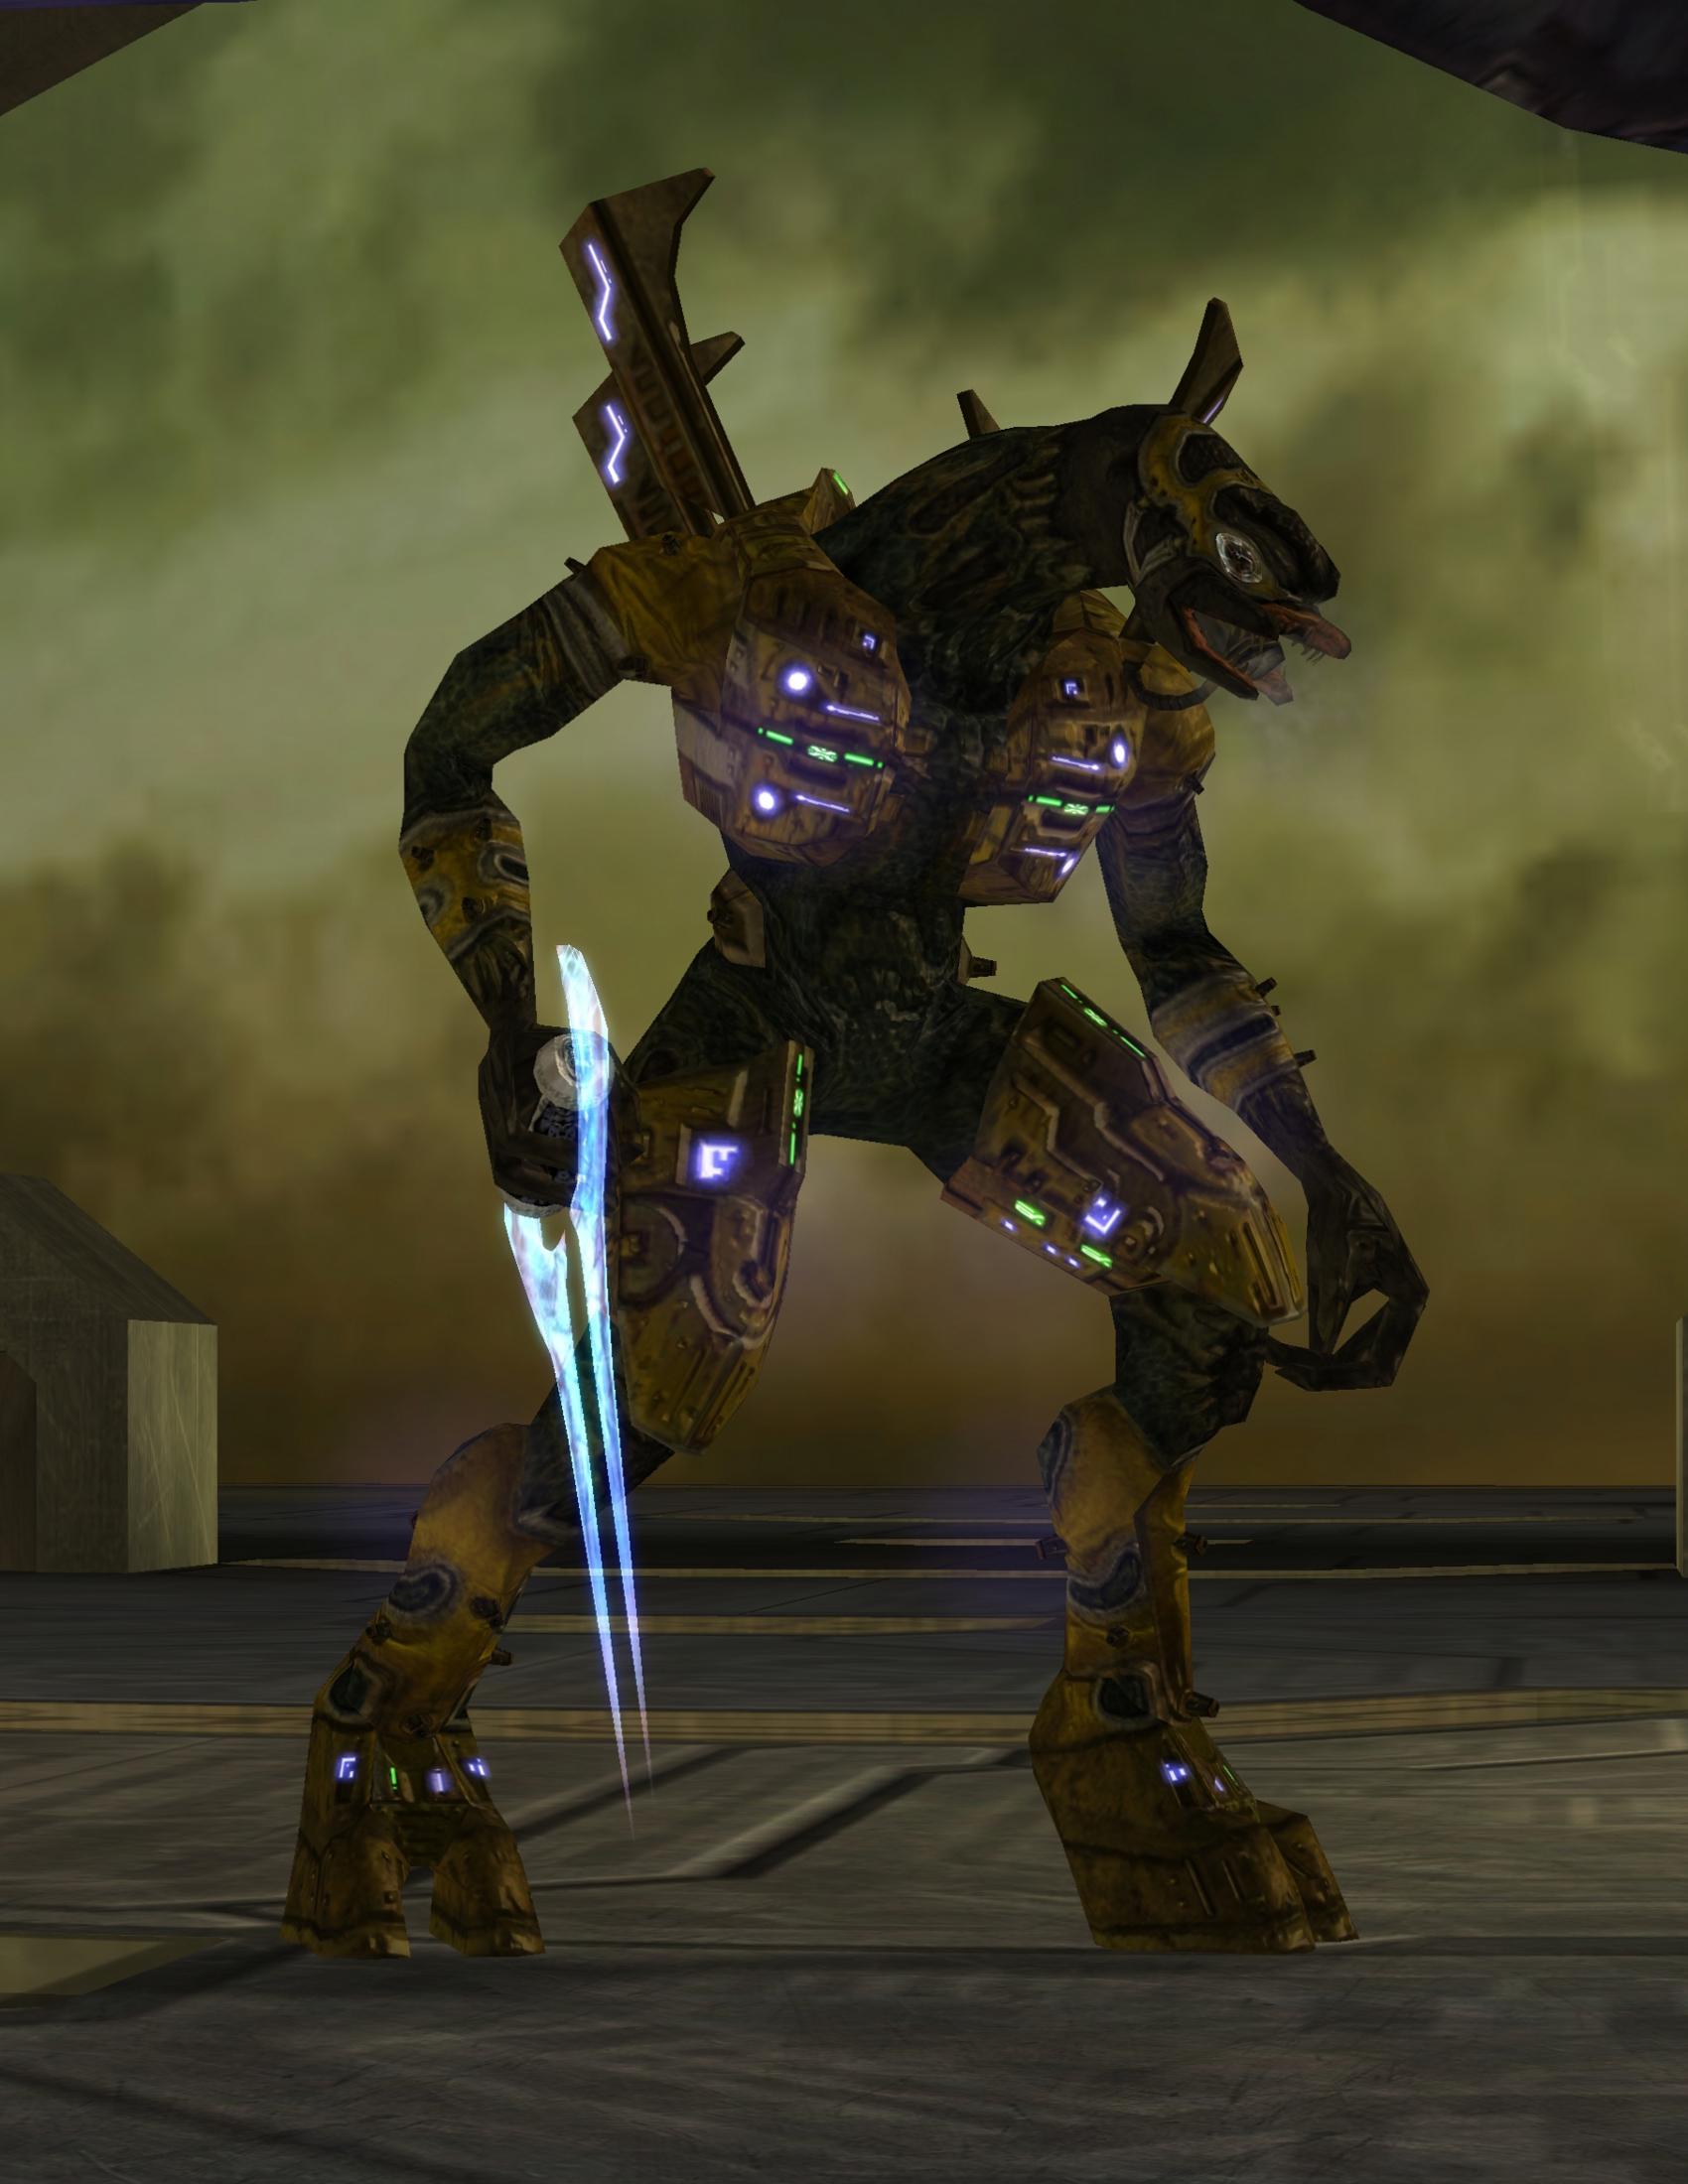 Halo 3 matchmaking history